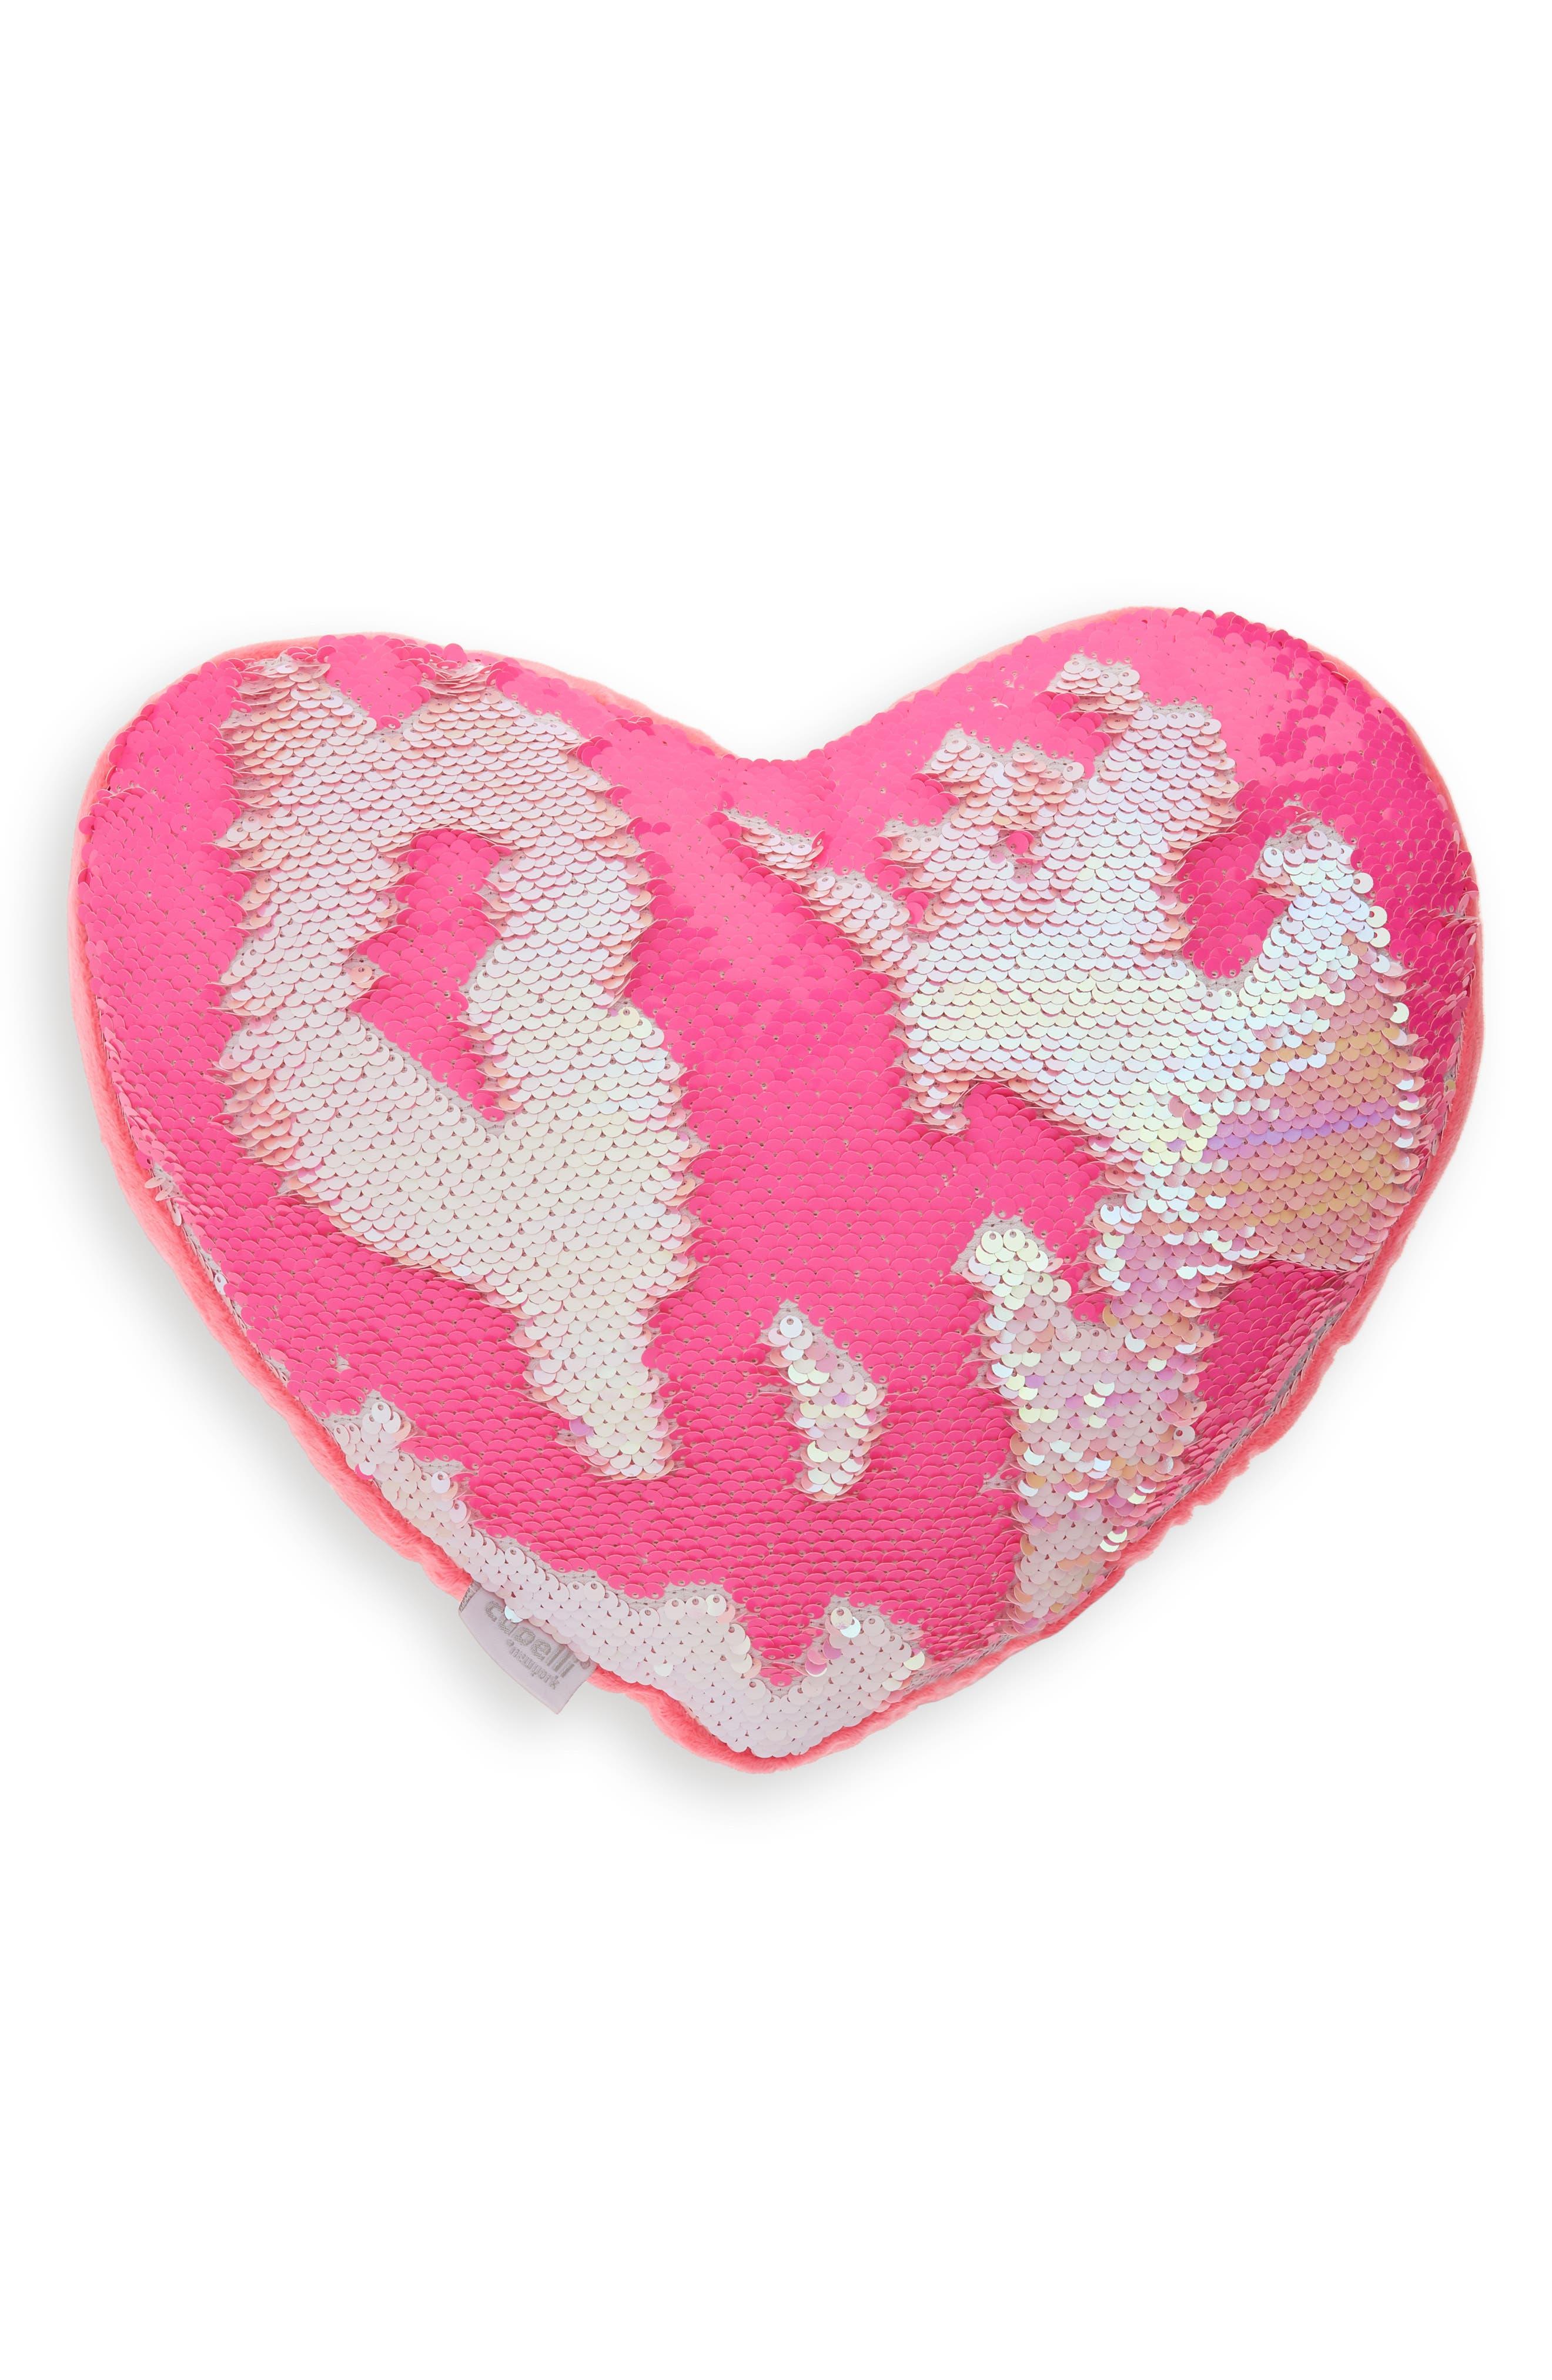 CAPELLI NEW YORK,                             Reversible Sequin Heart Pillow,                             Alternate thumbnail 5, color,                             PINK COMBO